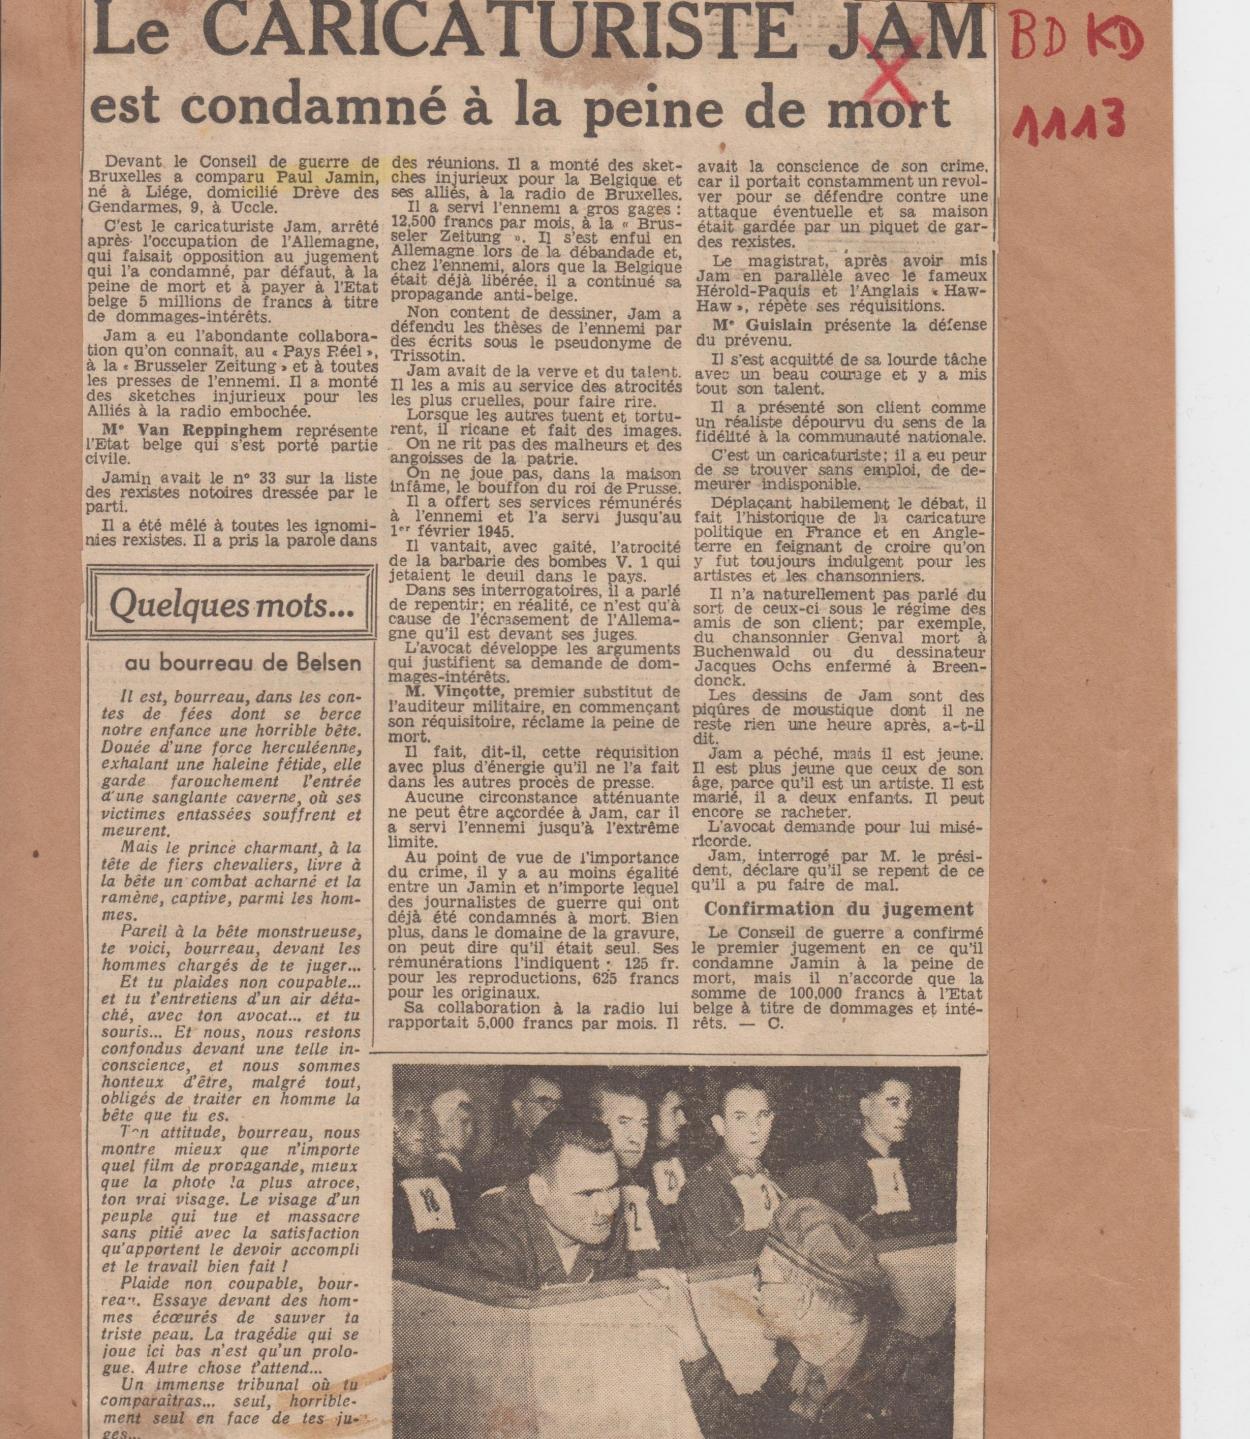 BDKD1113_Paul Jamin_Dernière Heure_condamnation (25.09.1945)